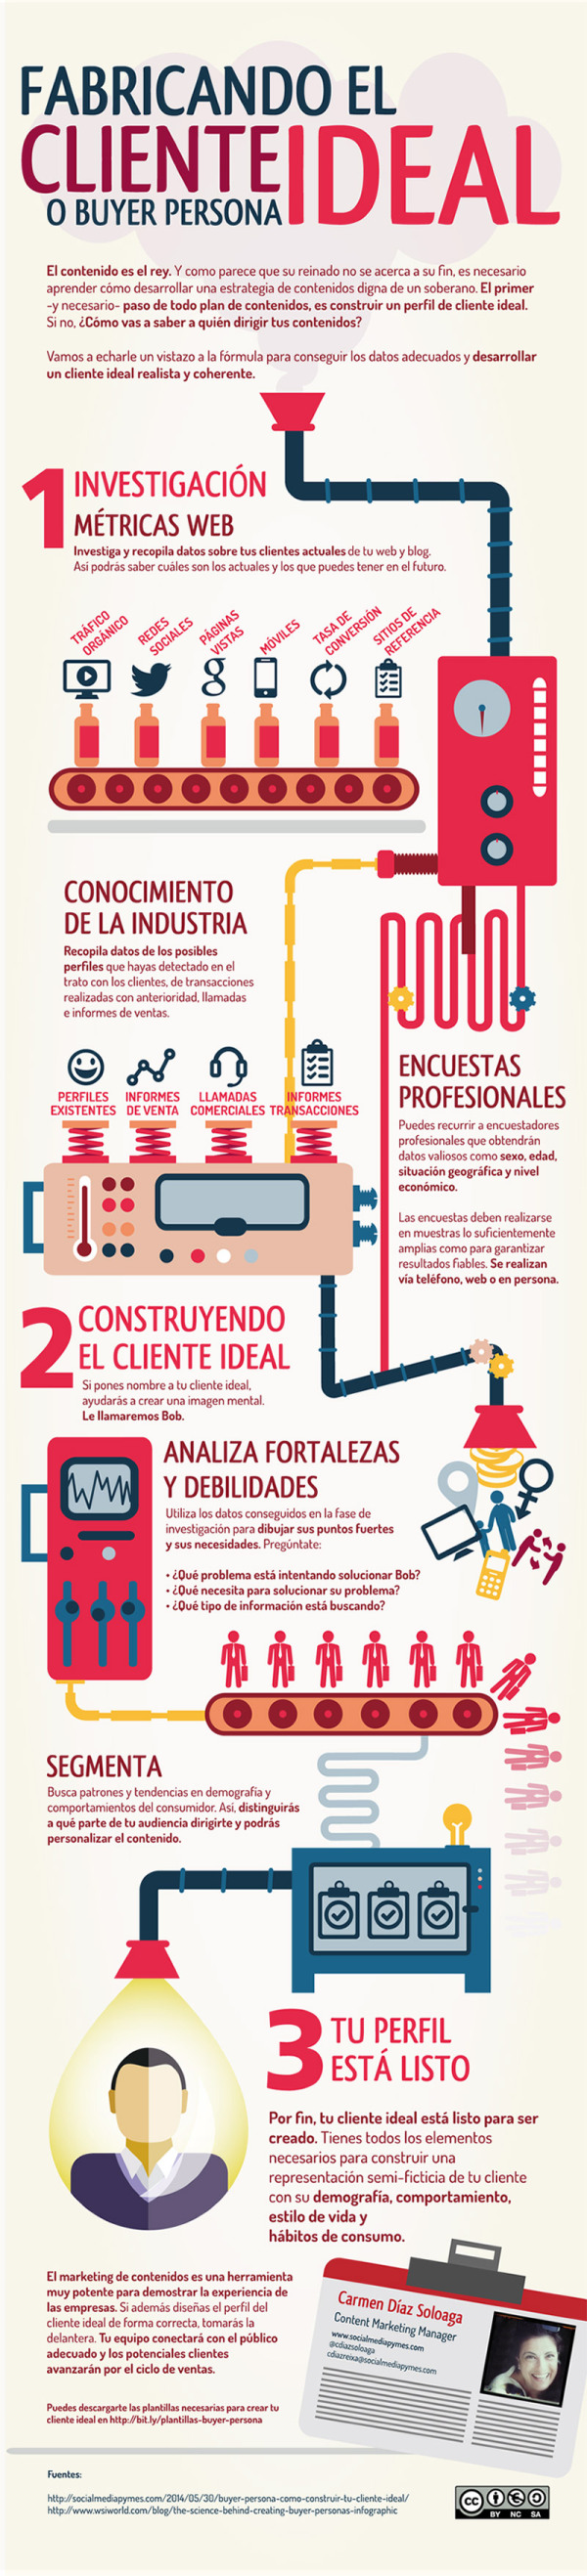 Construyendo El Cliente Ideal Infografia Infographic Marketing Marketing De Contenidos Mercadotecnia Entrante Estrategias De Marketing